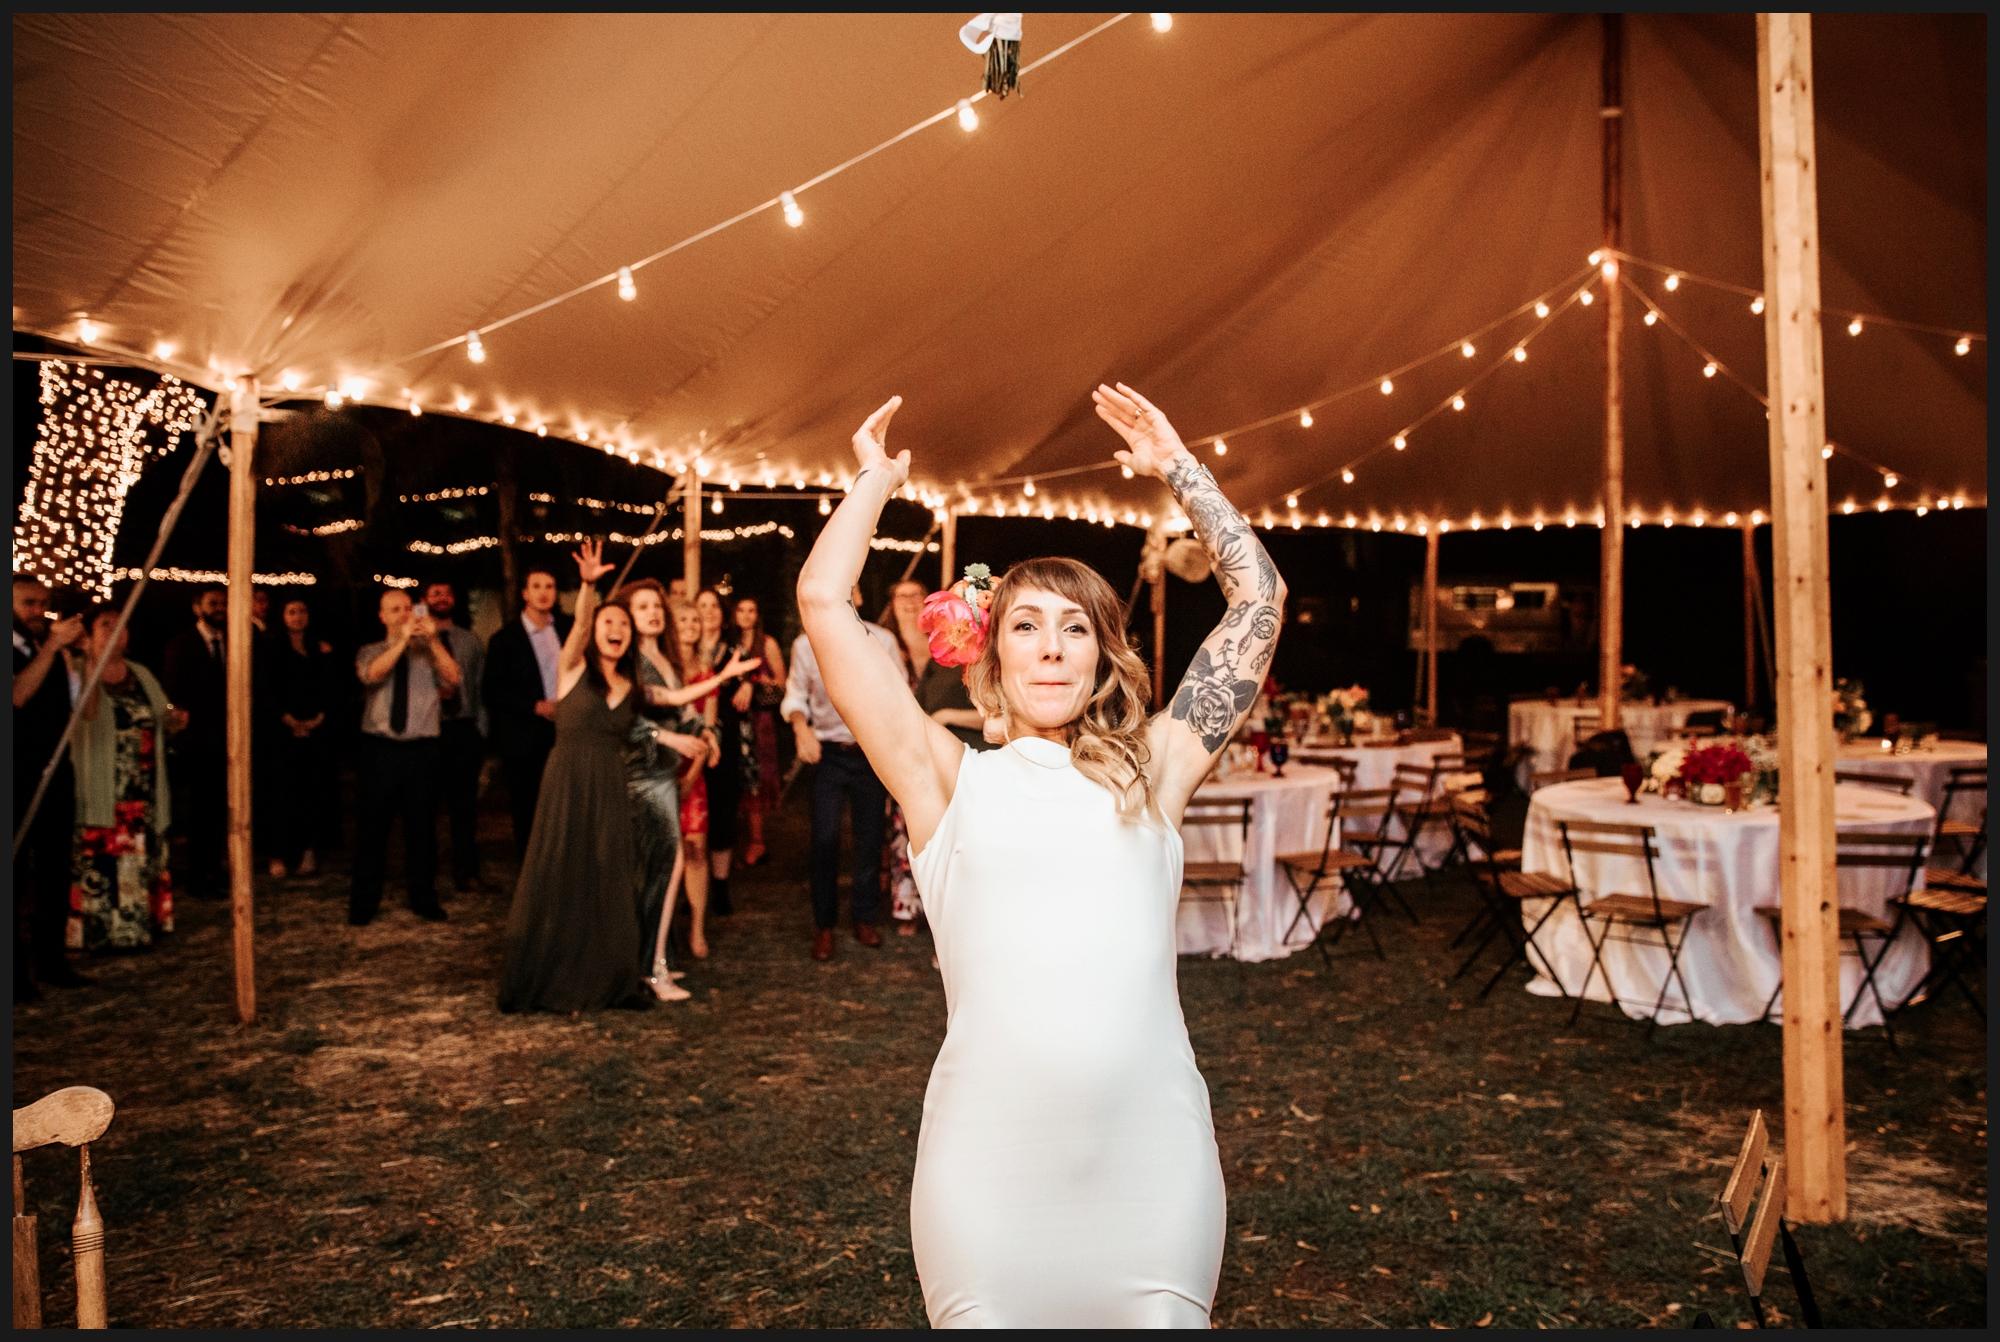 Orlando-Wedding-Photographer-destination-wedding-photographer-florida-wedding-photographer-bohemian-wedding-photographer_2052.jpg